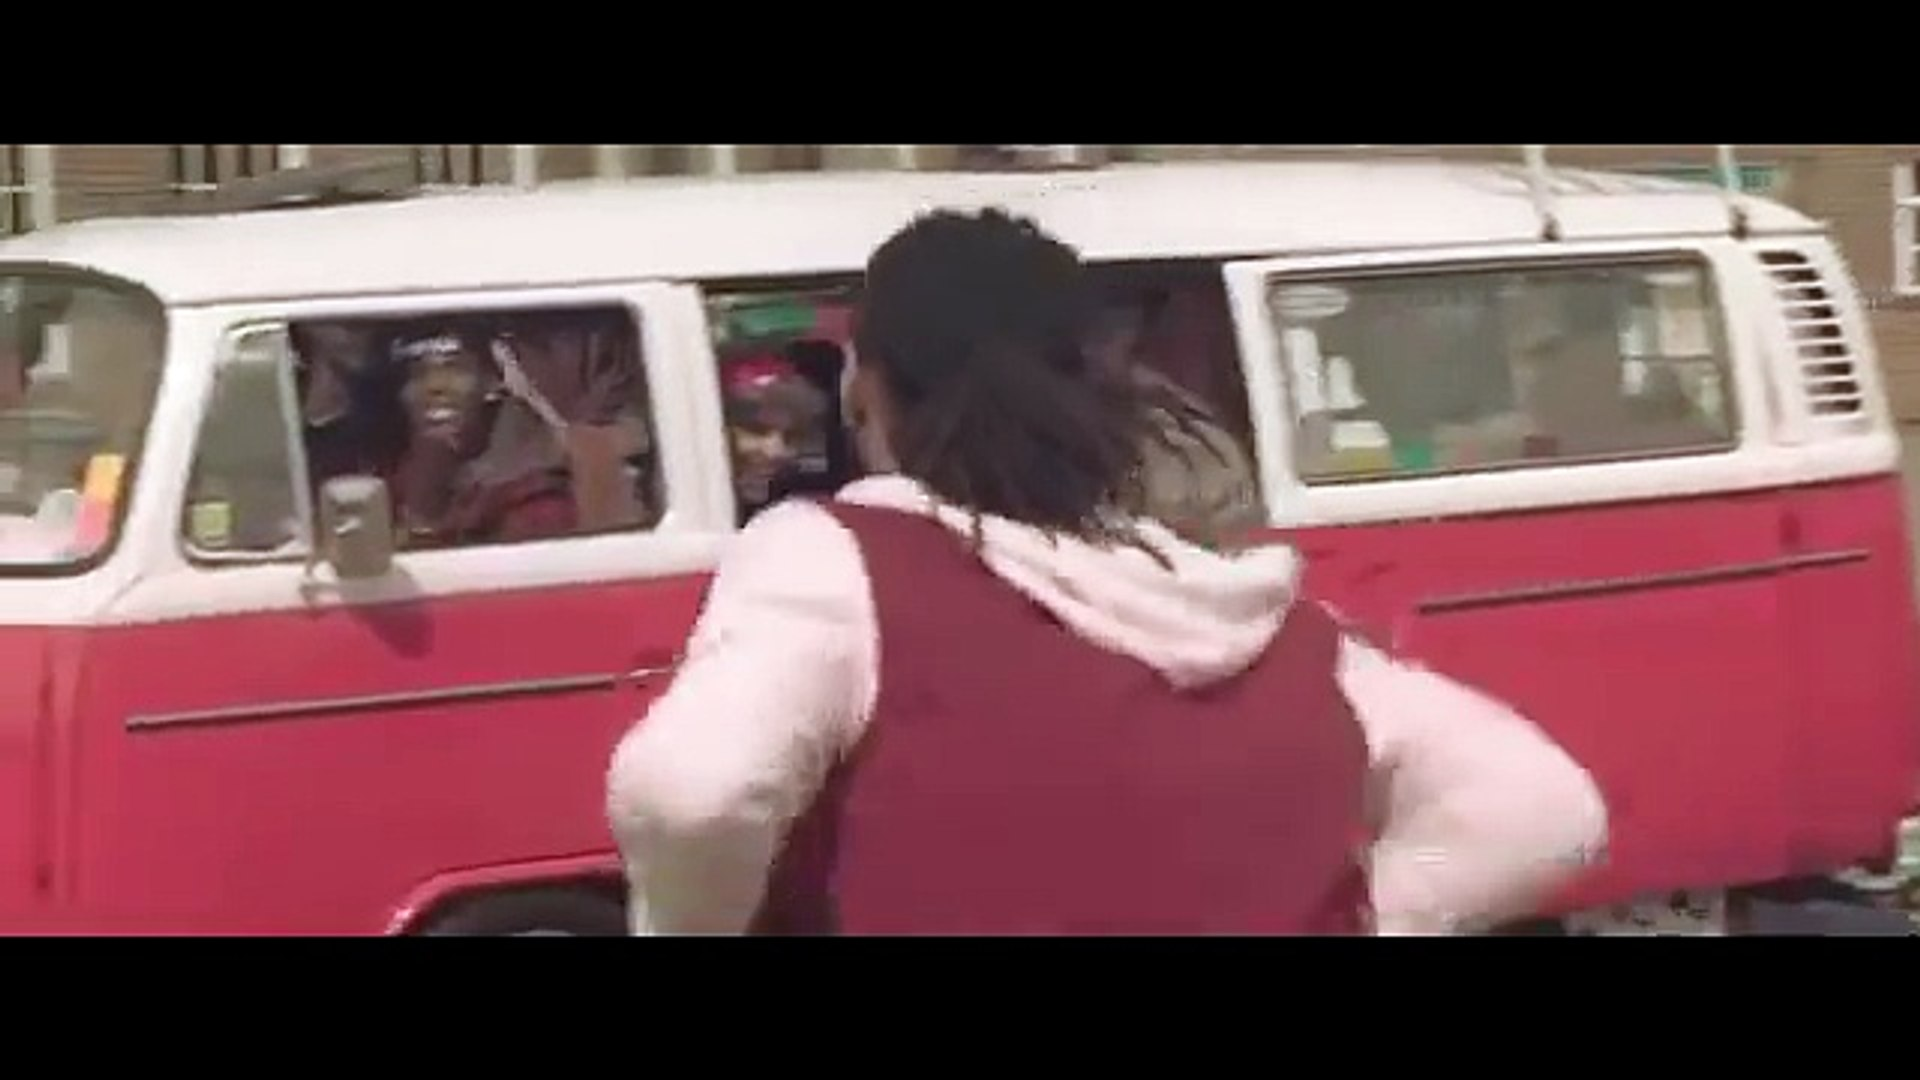 Bluey Robinson - Coming Back